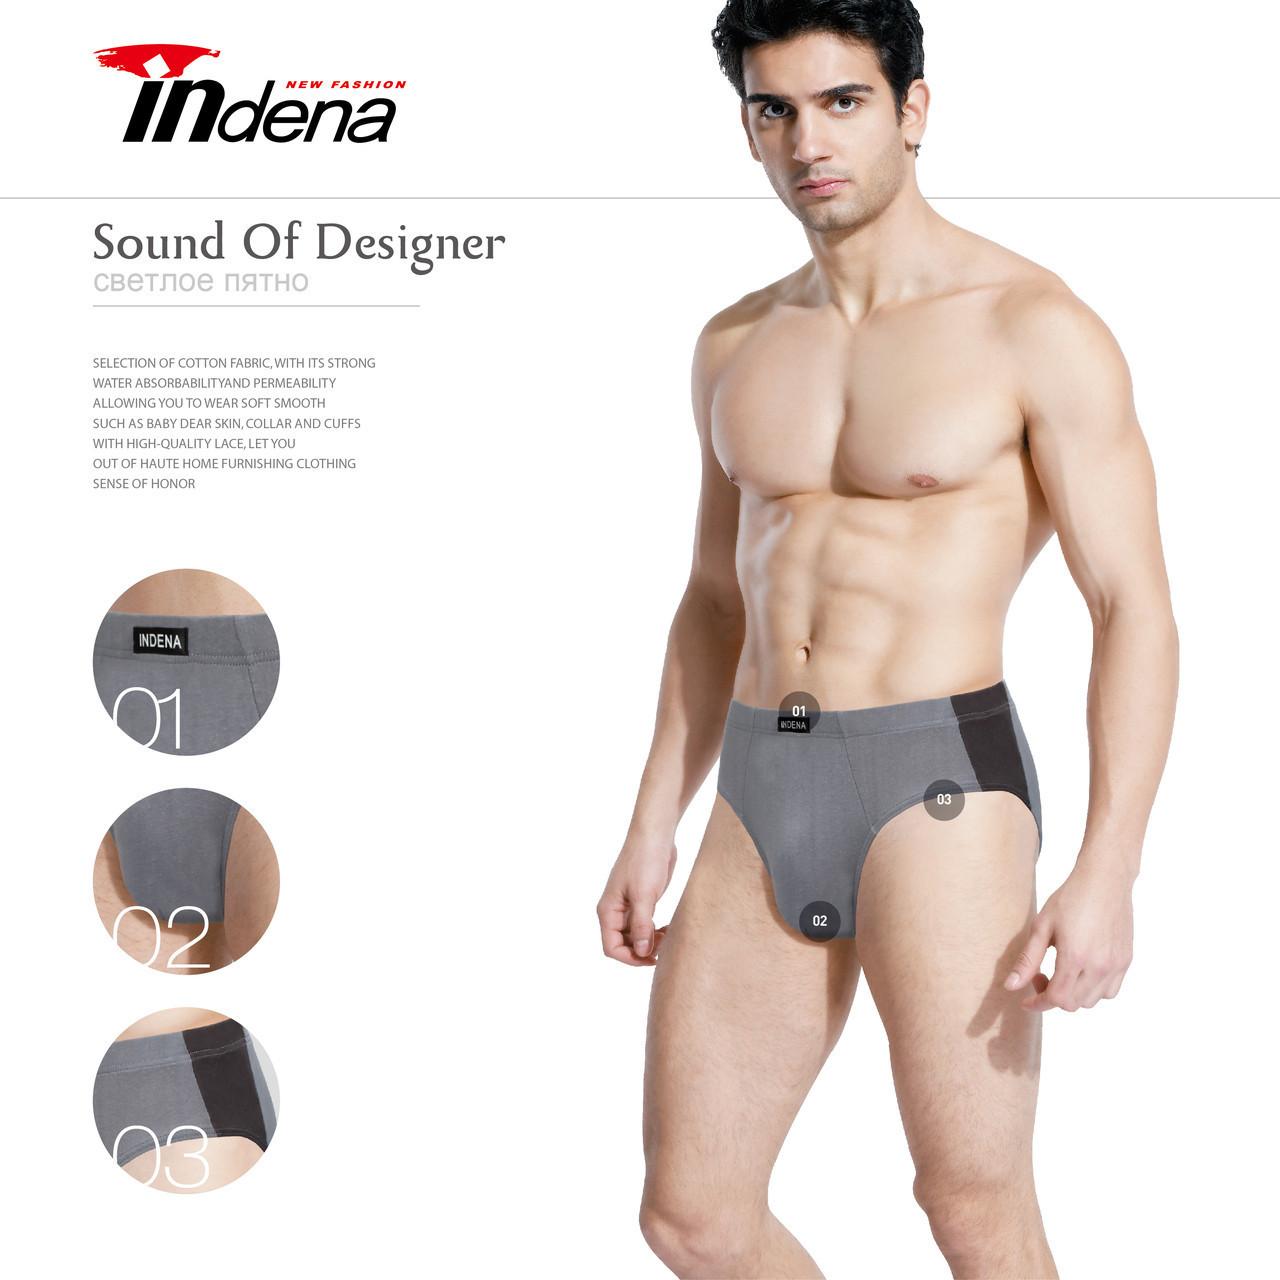 65ca765306f86 Мужские трусы плавки Indena underwear 100% хлопок два размера упаковка  3XL-4XL ТМП-2090